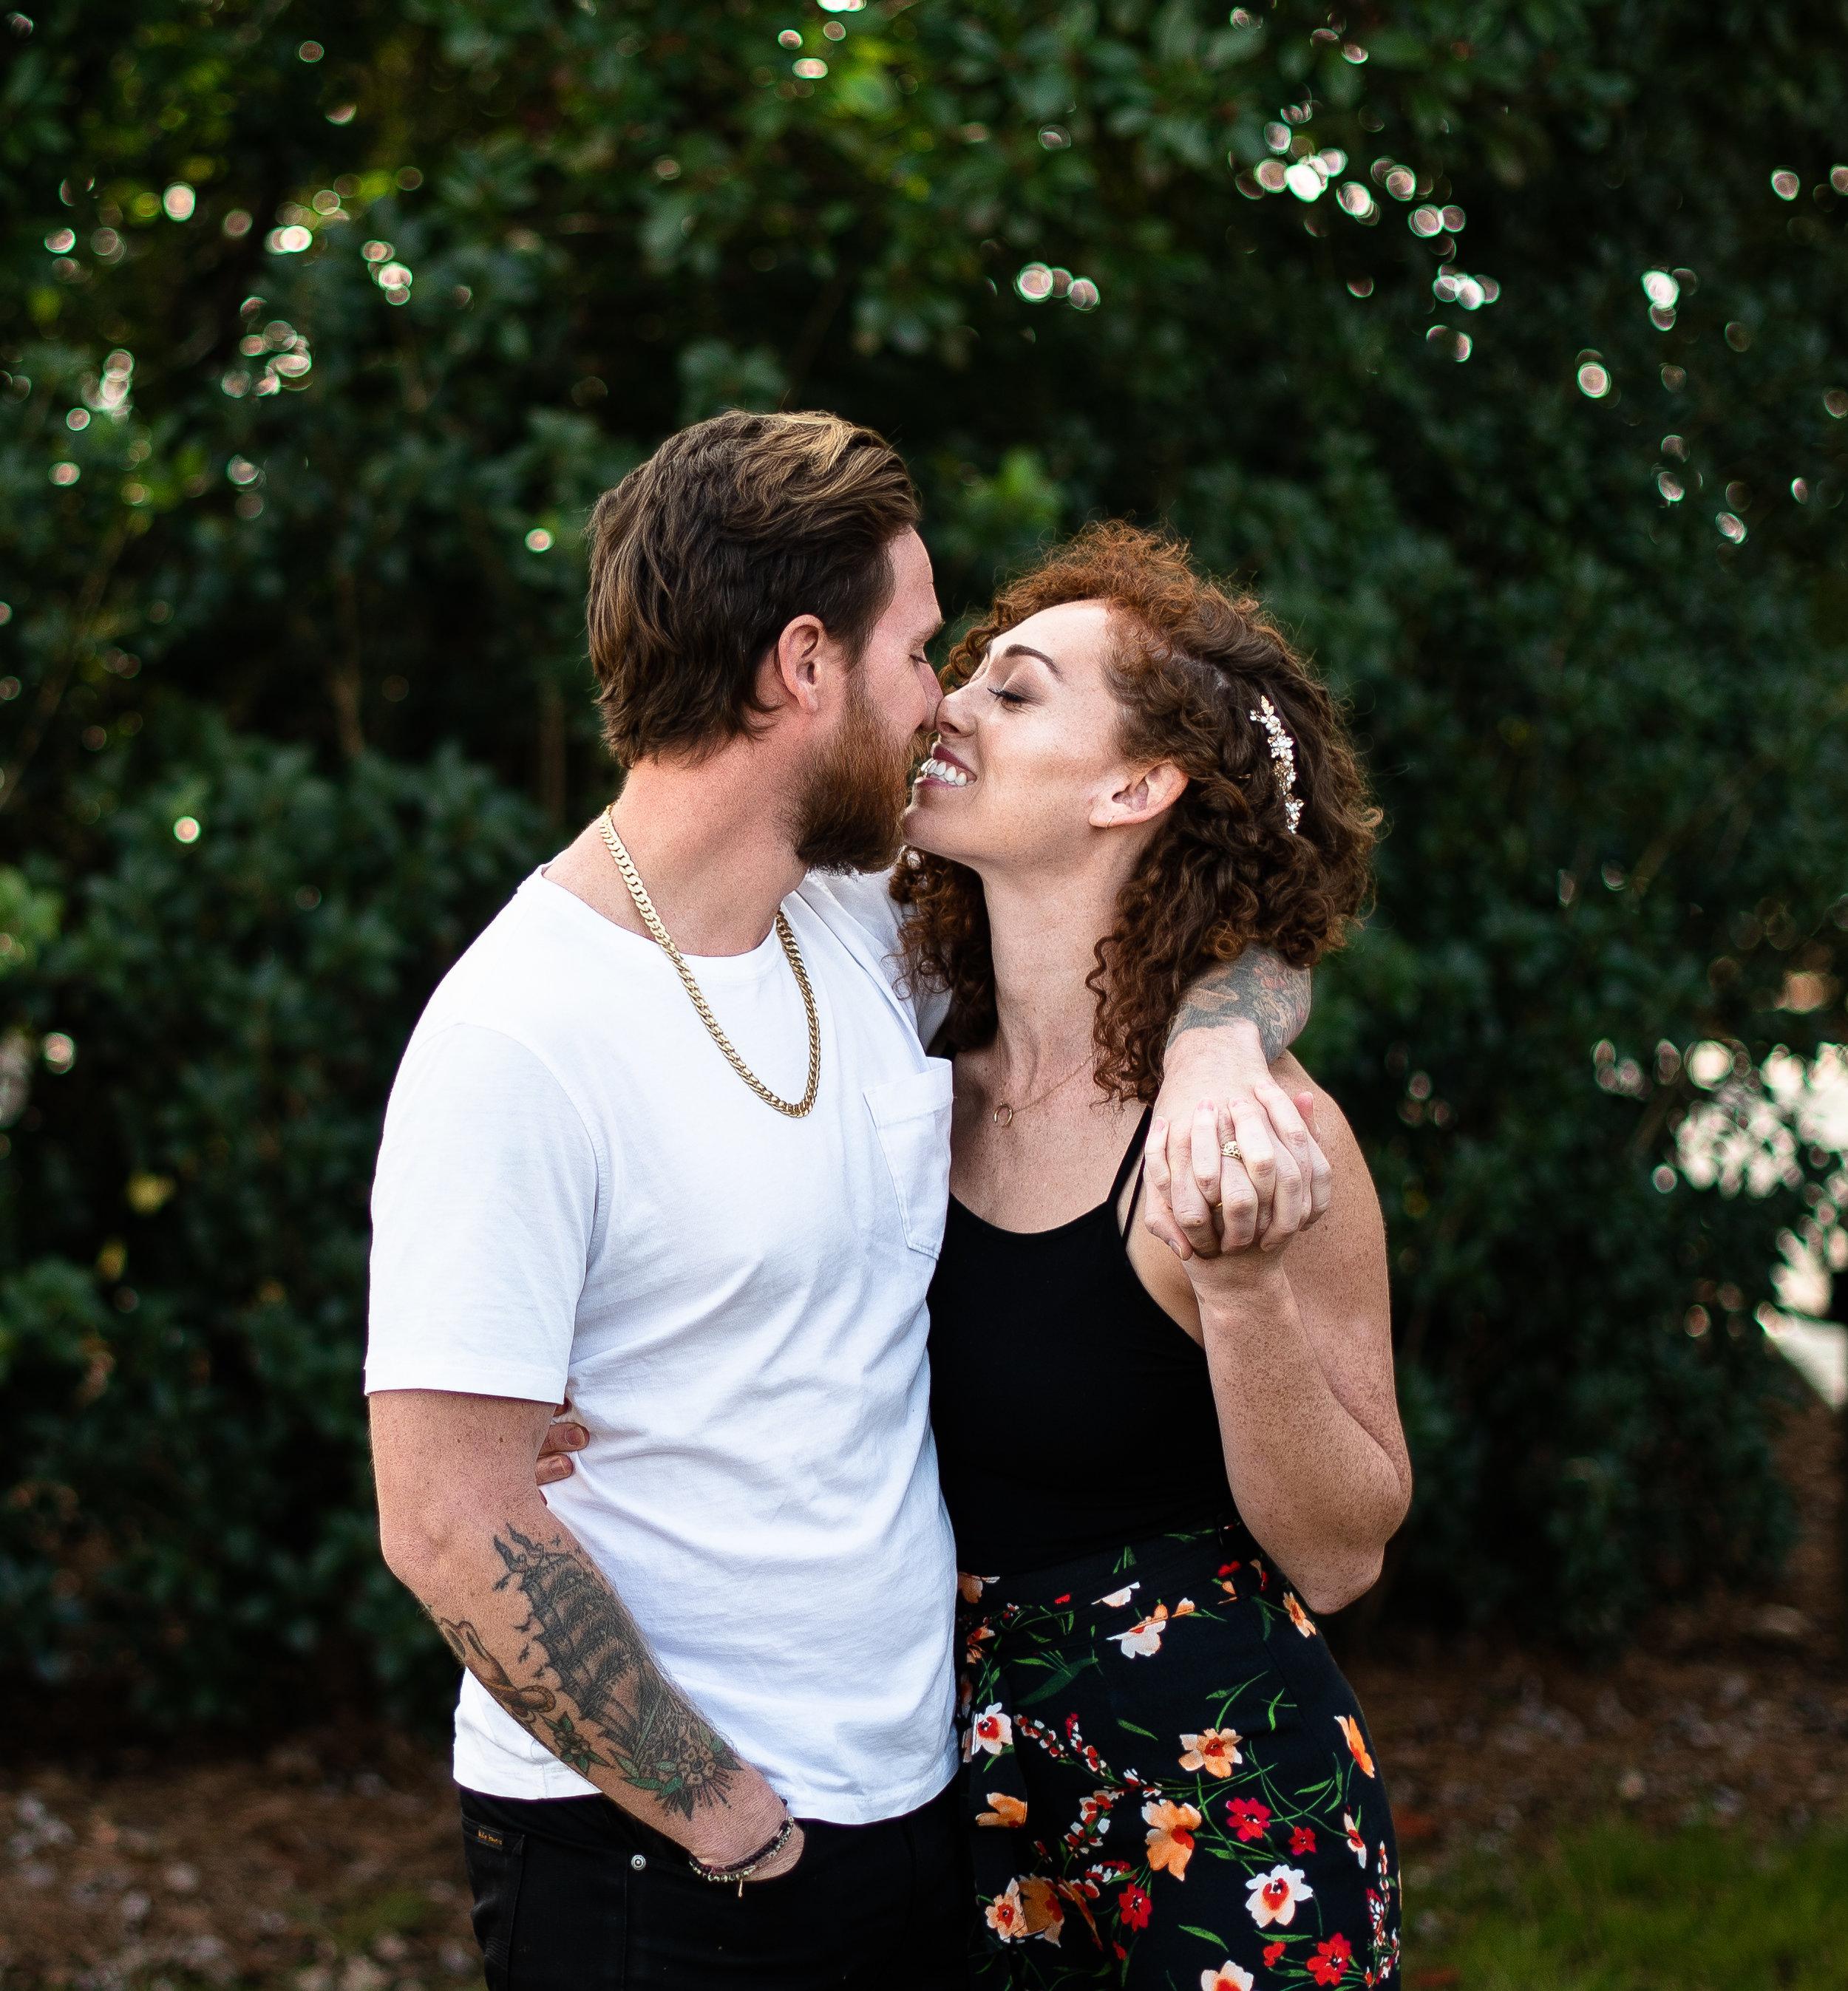 High Point Wedding Photographer - NC Weddings - Yasmin Leonard Photography-1.jpg